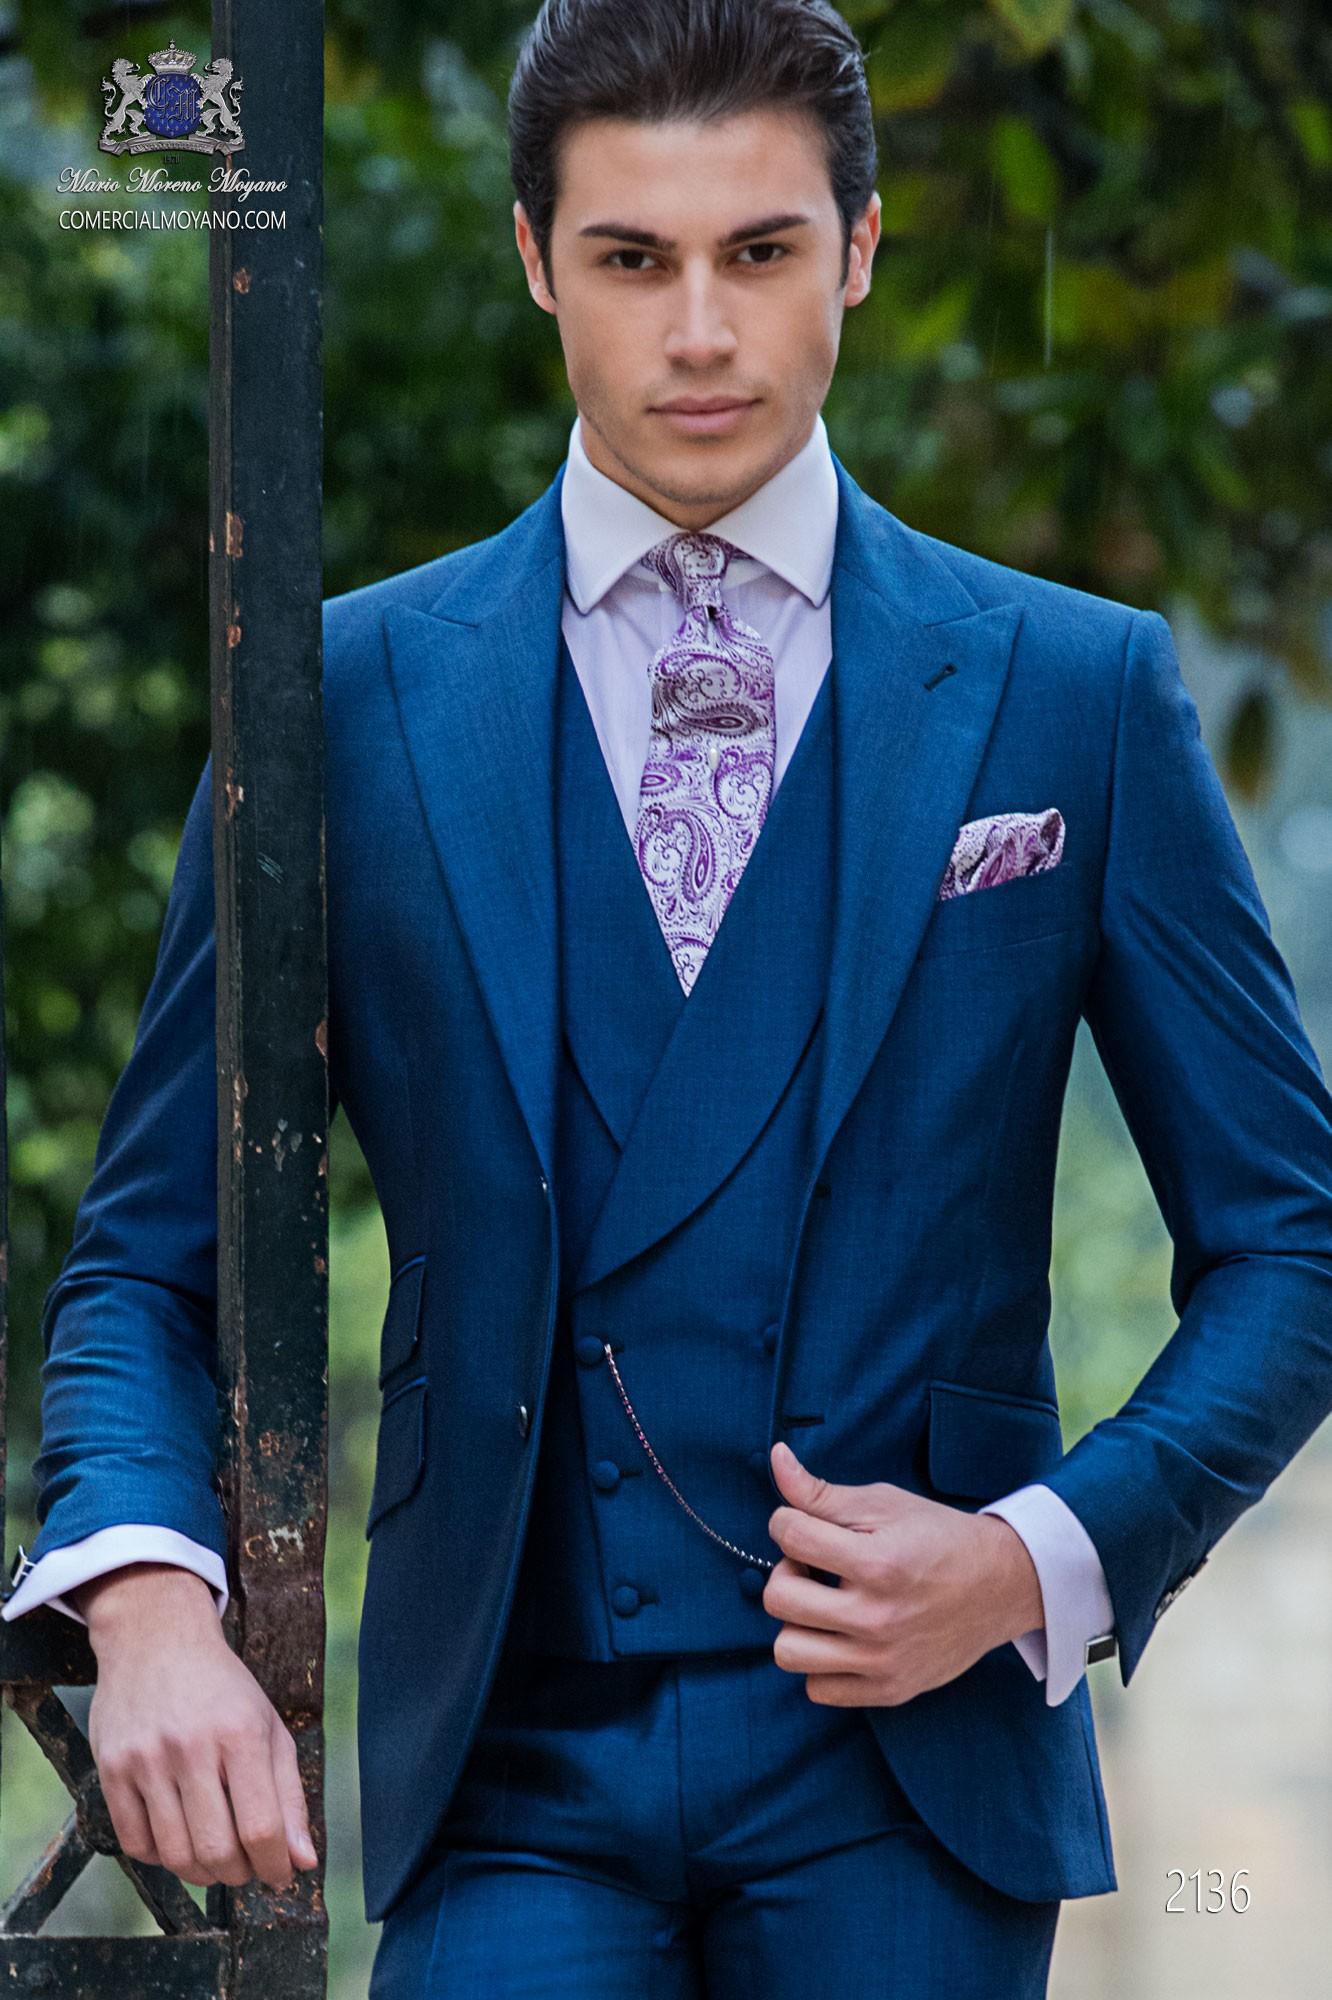 preiswert kaufen neu kommen an klare Textur Royal blaue Anzug aus Mohair Wollmischung Alpaka